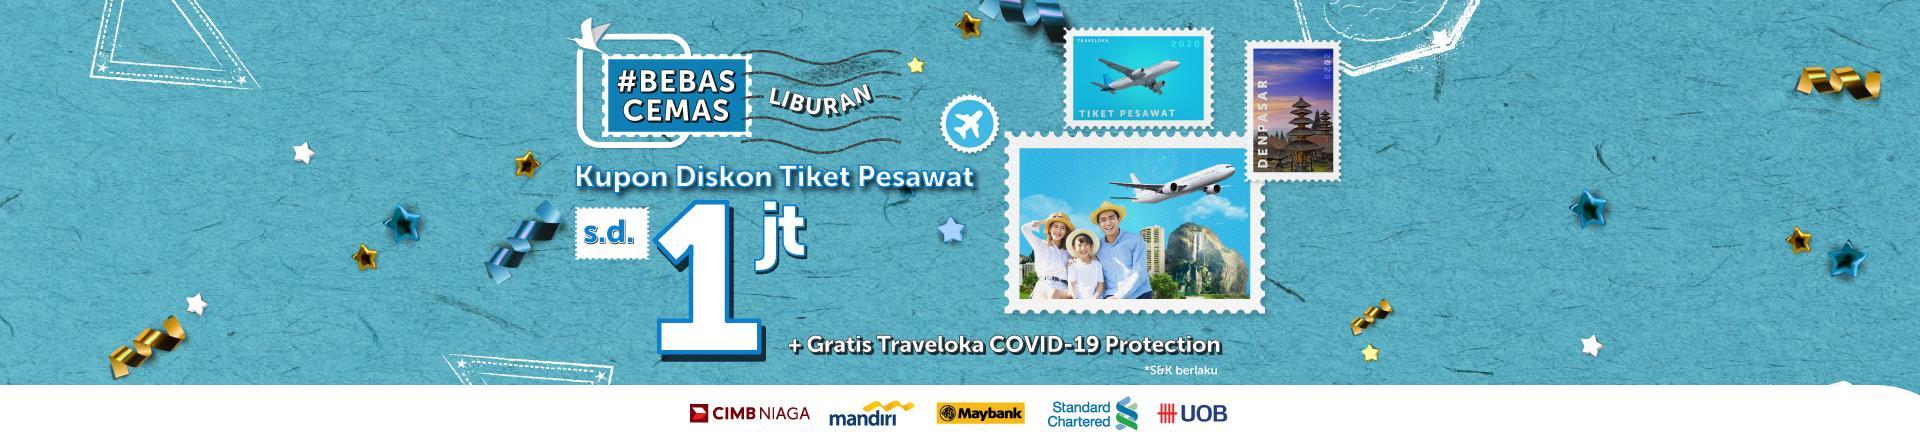 Kode Promo Traveloka Rp 500 000 Promo Februari 2021